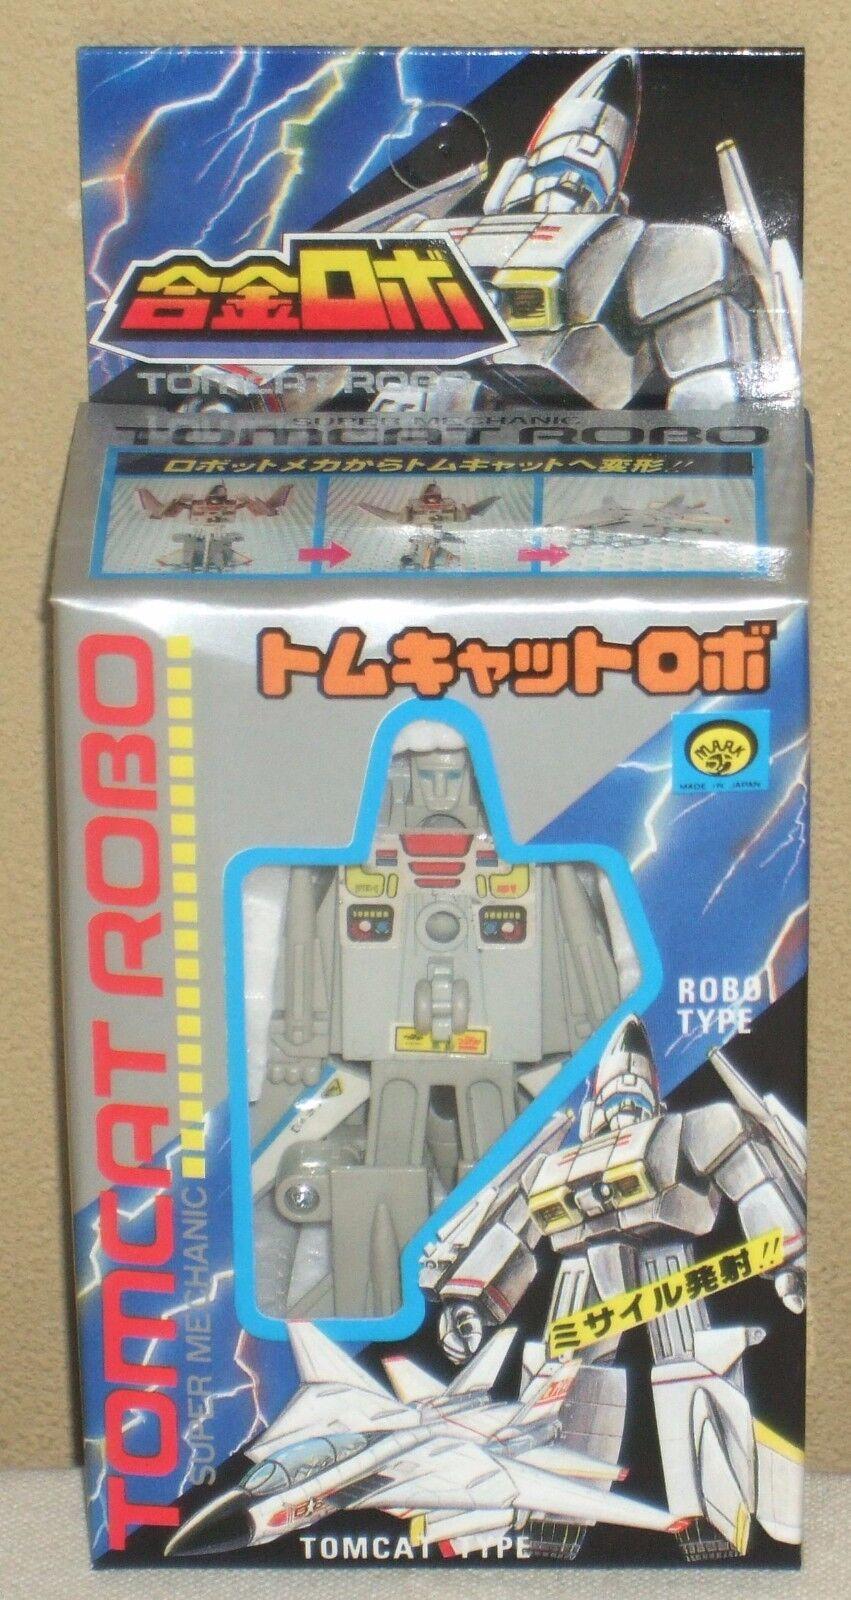 Tomcat Robo F-14 Transformers 7.8cm 3.1  Chogokin Figures Dolls Mark Unused Mint